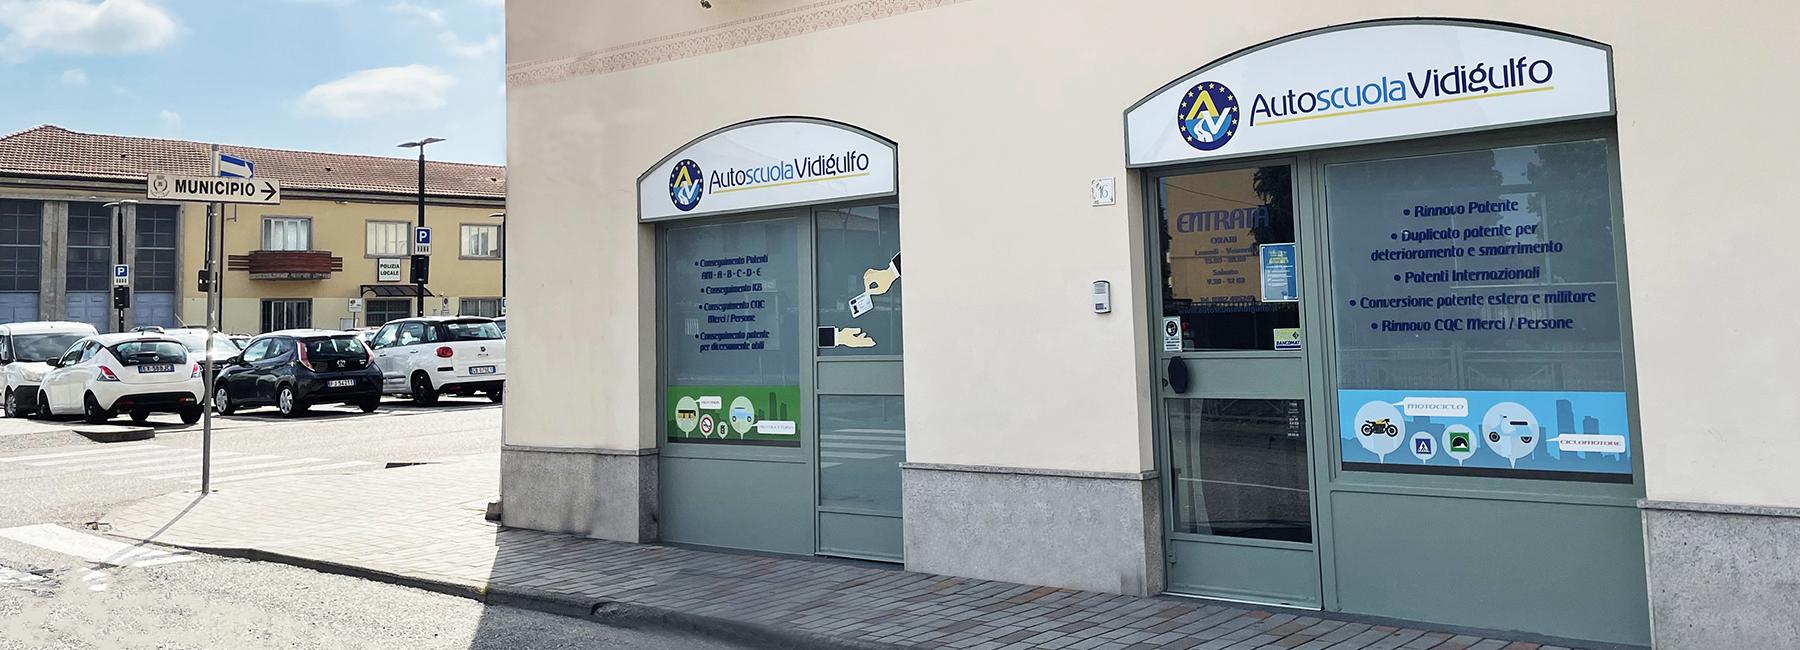 Autoscuola Vidigulfo